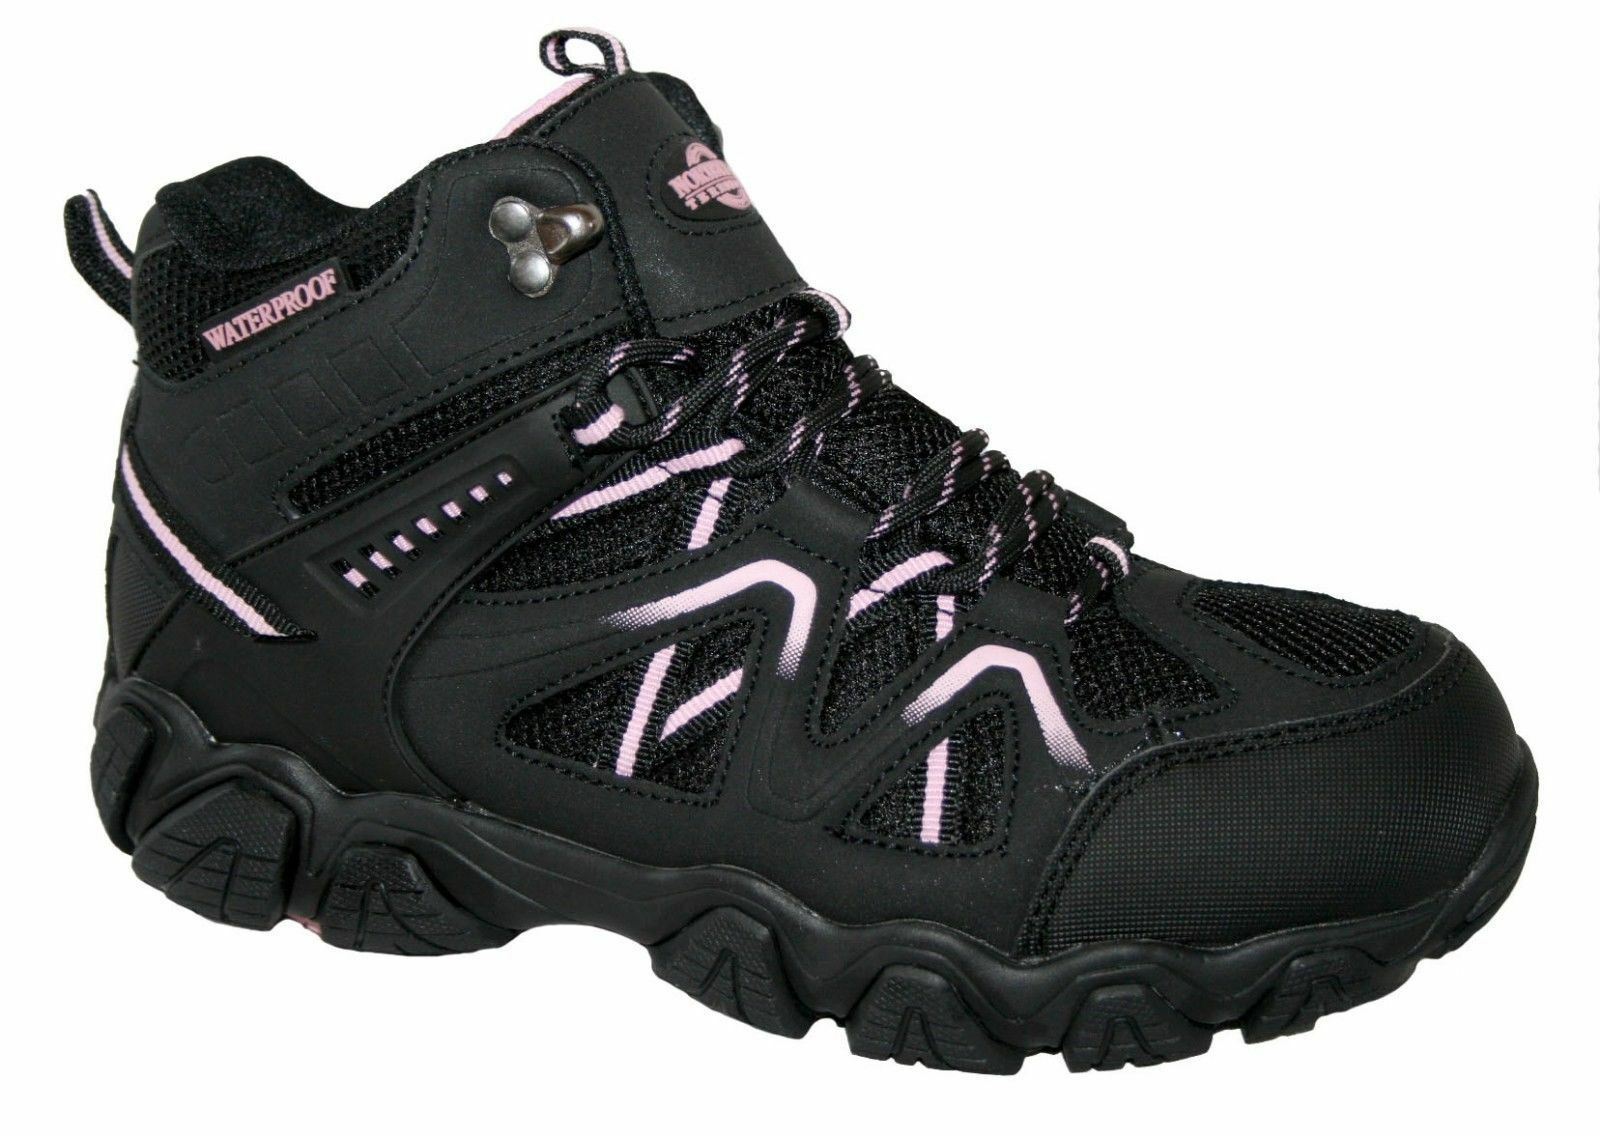 Northwest Territory Ladies Women's Waterproof Leather Walking Hiking Ankle Boots